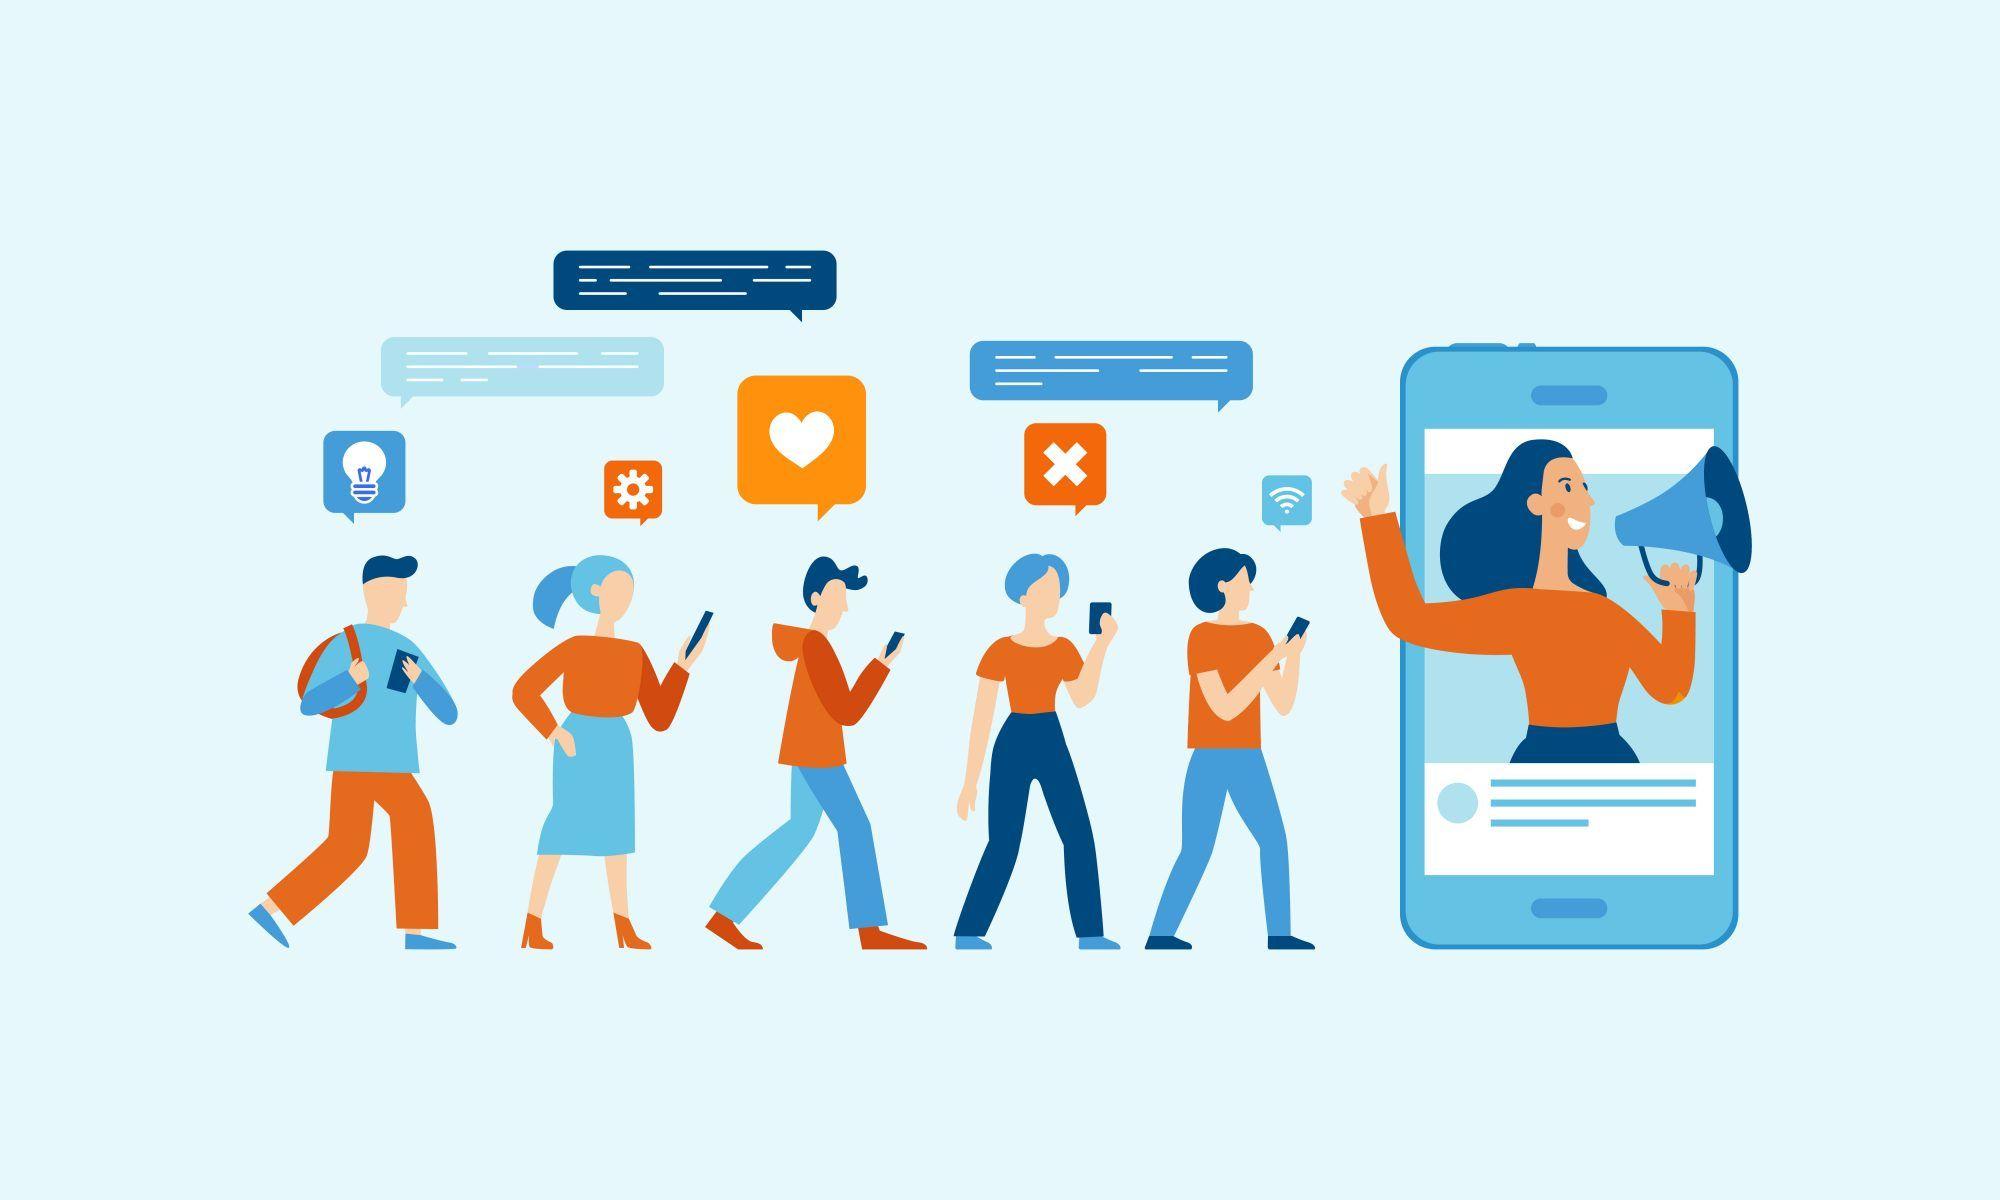 B2B Influencer Marketing Strategy: Reputation by Association